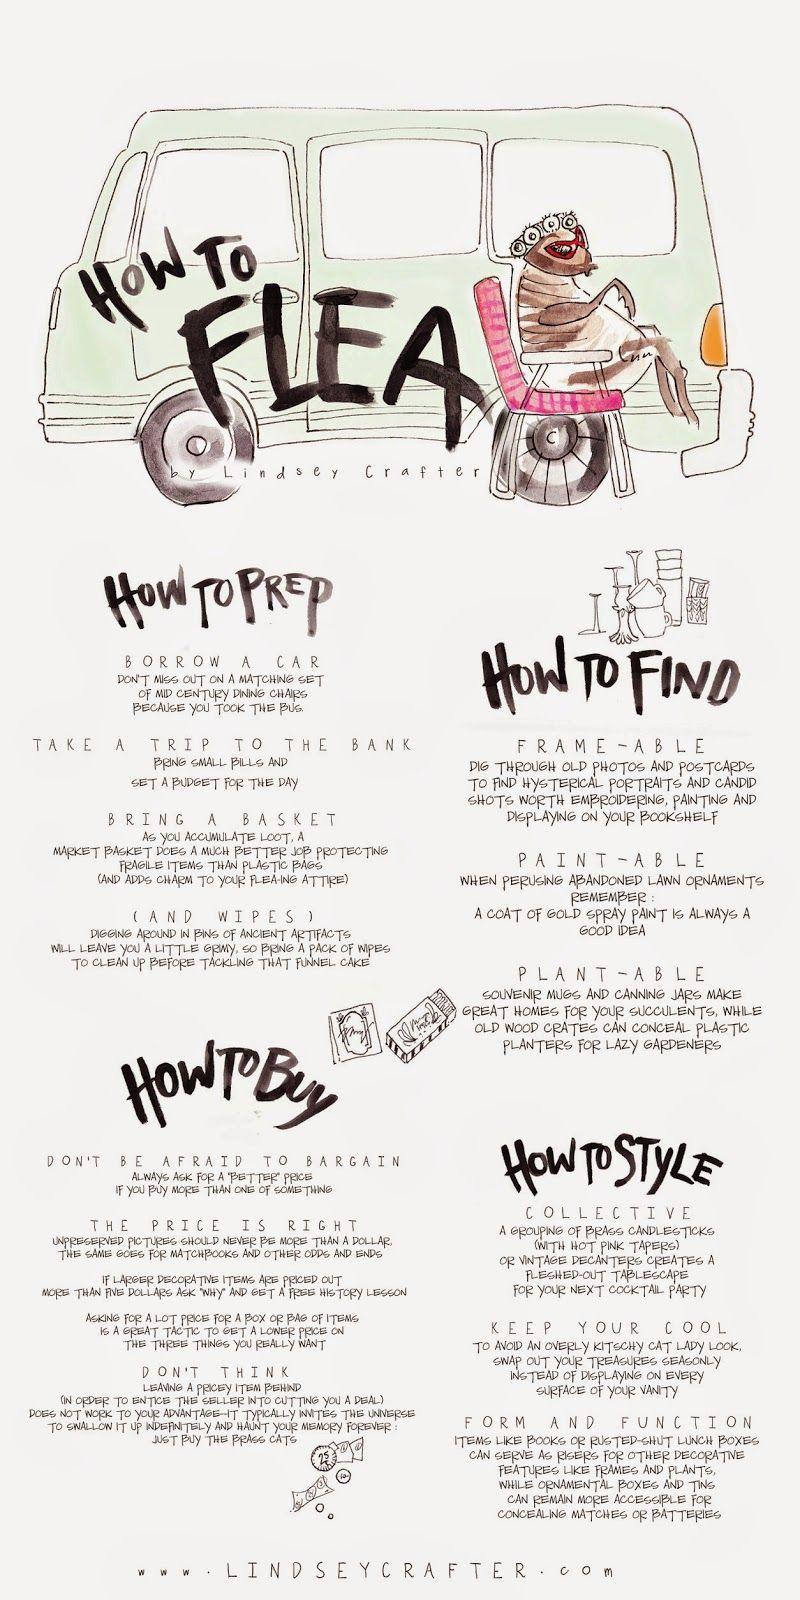 How To Flea An Info Graphic Guide Markets Fleas